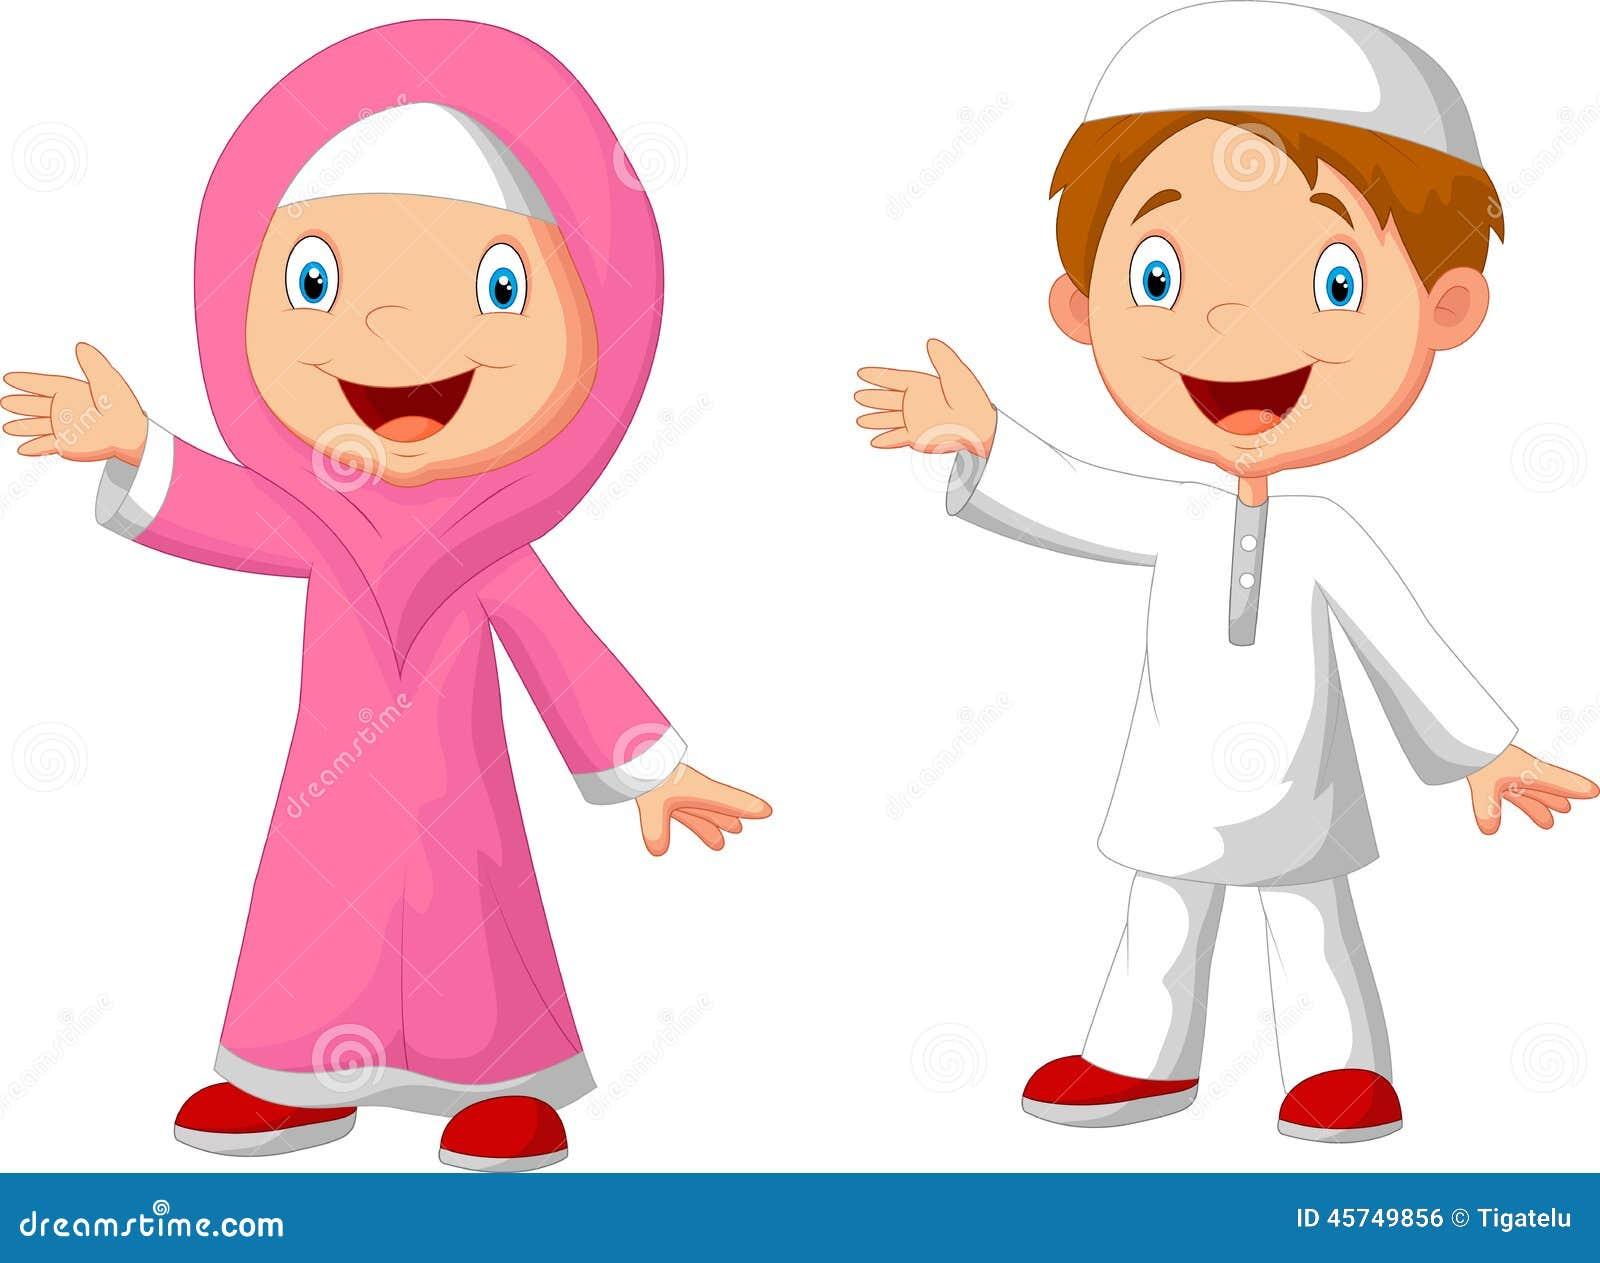 Happy Muslim Kid Cartoon Stock Vector - Image: 45749856